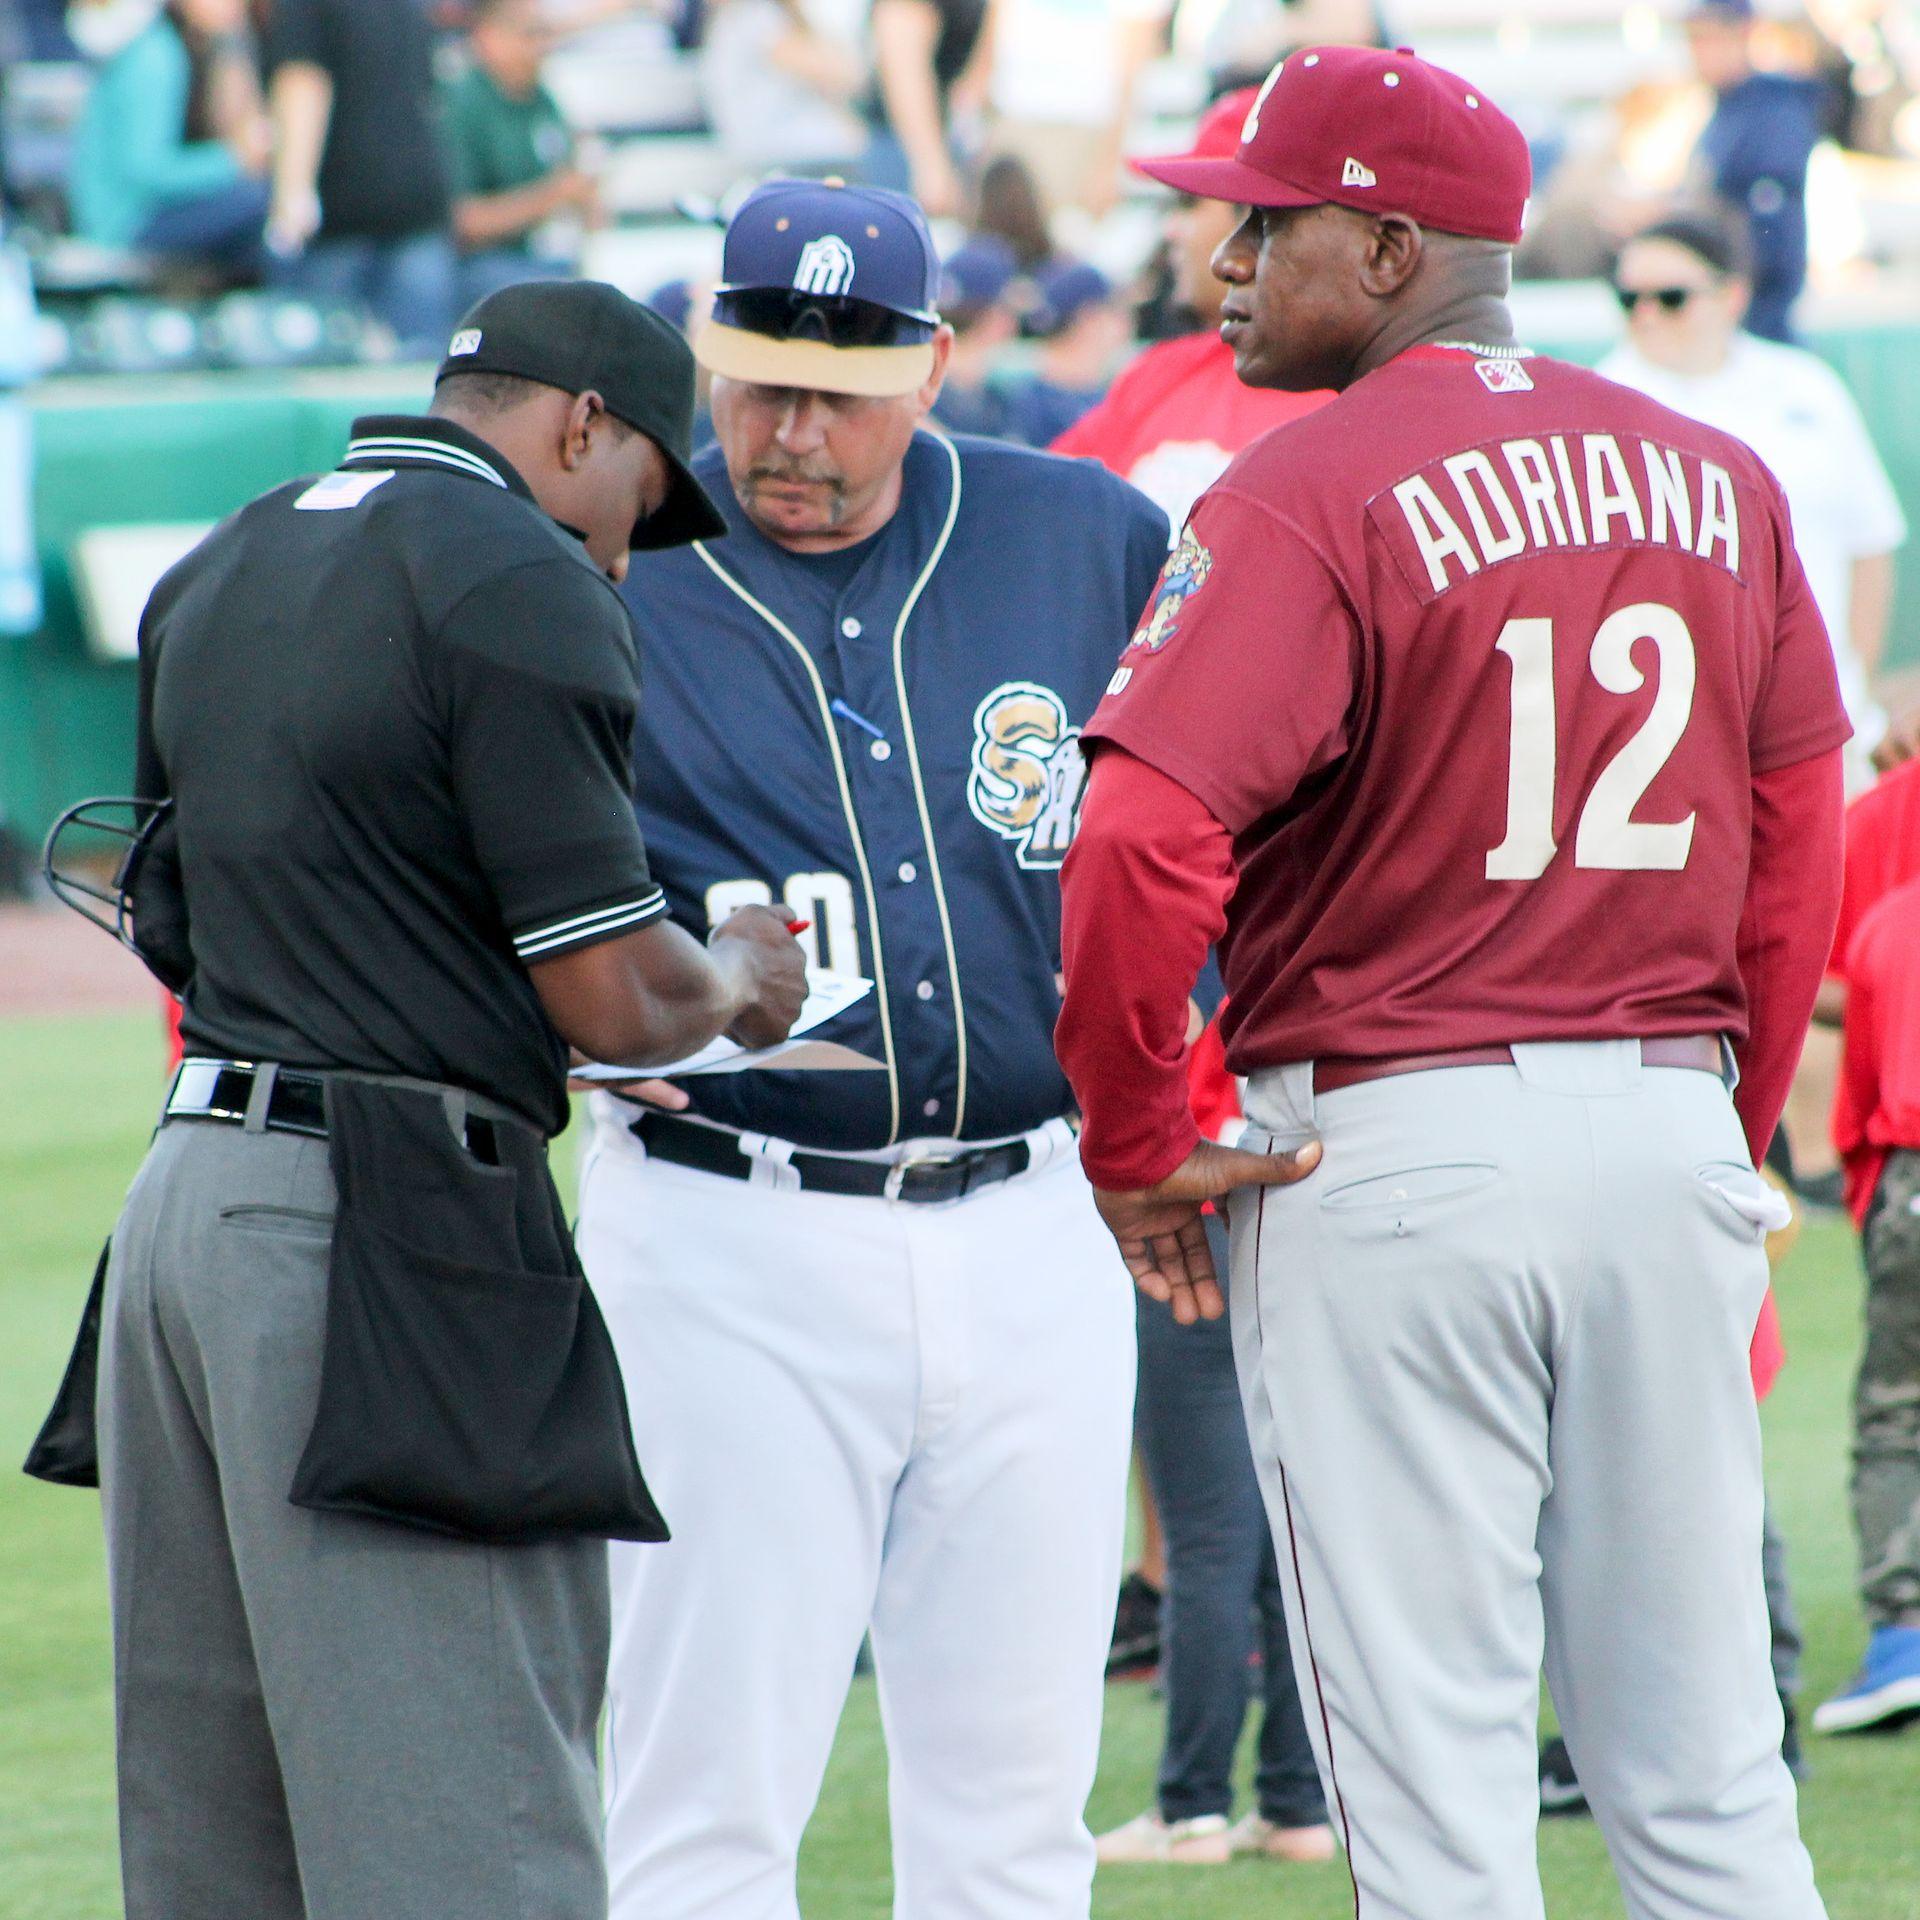 Umpire (baseball) - Wikipedia